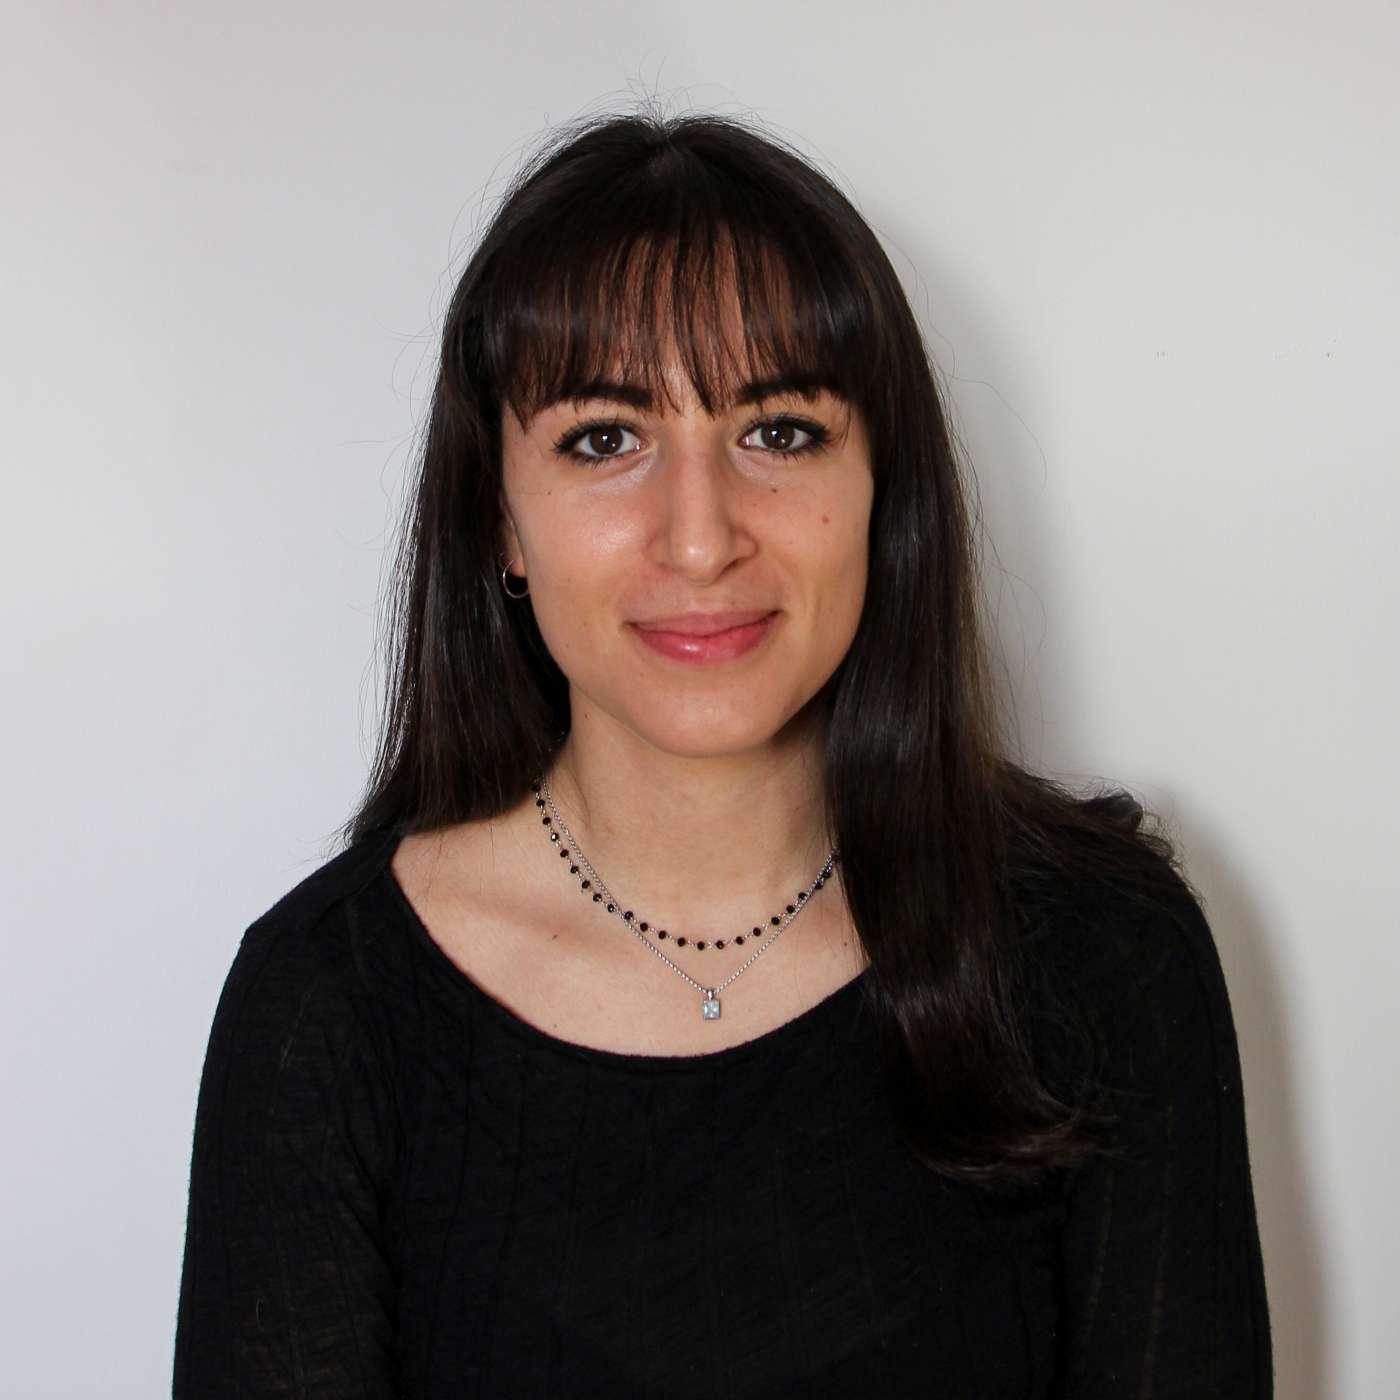 Eliana Morandi